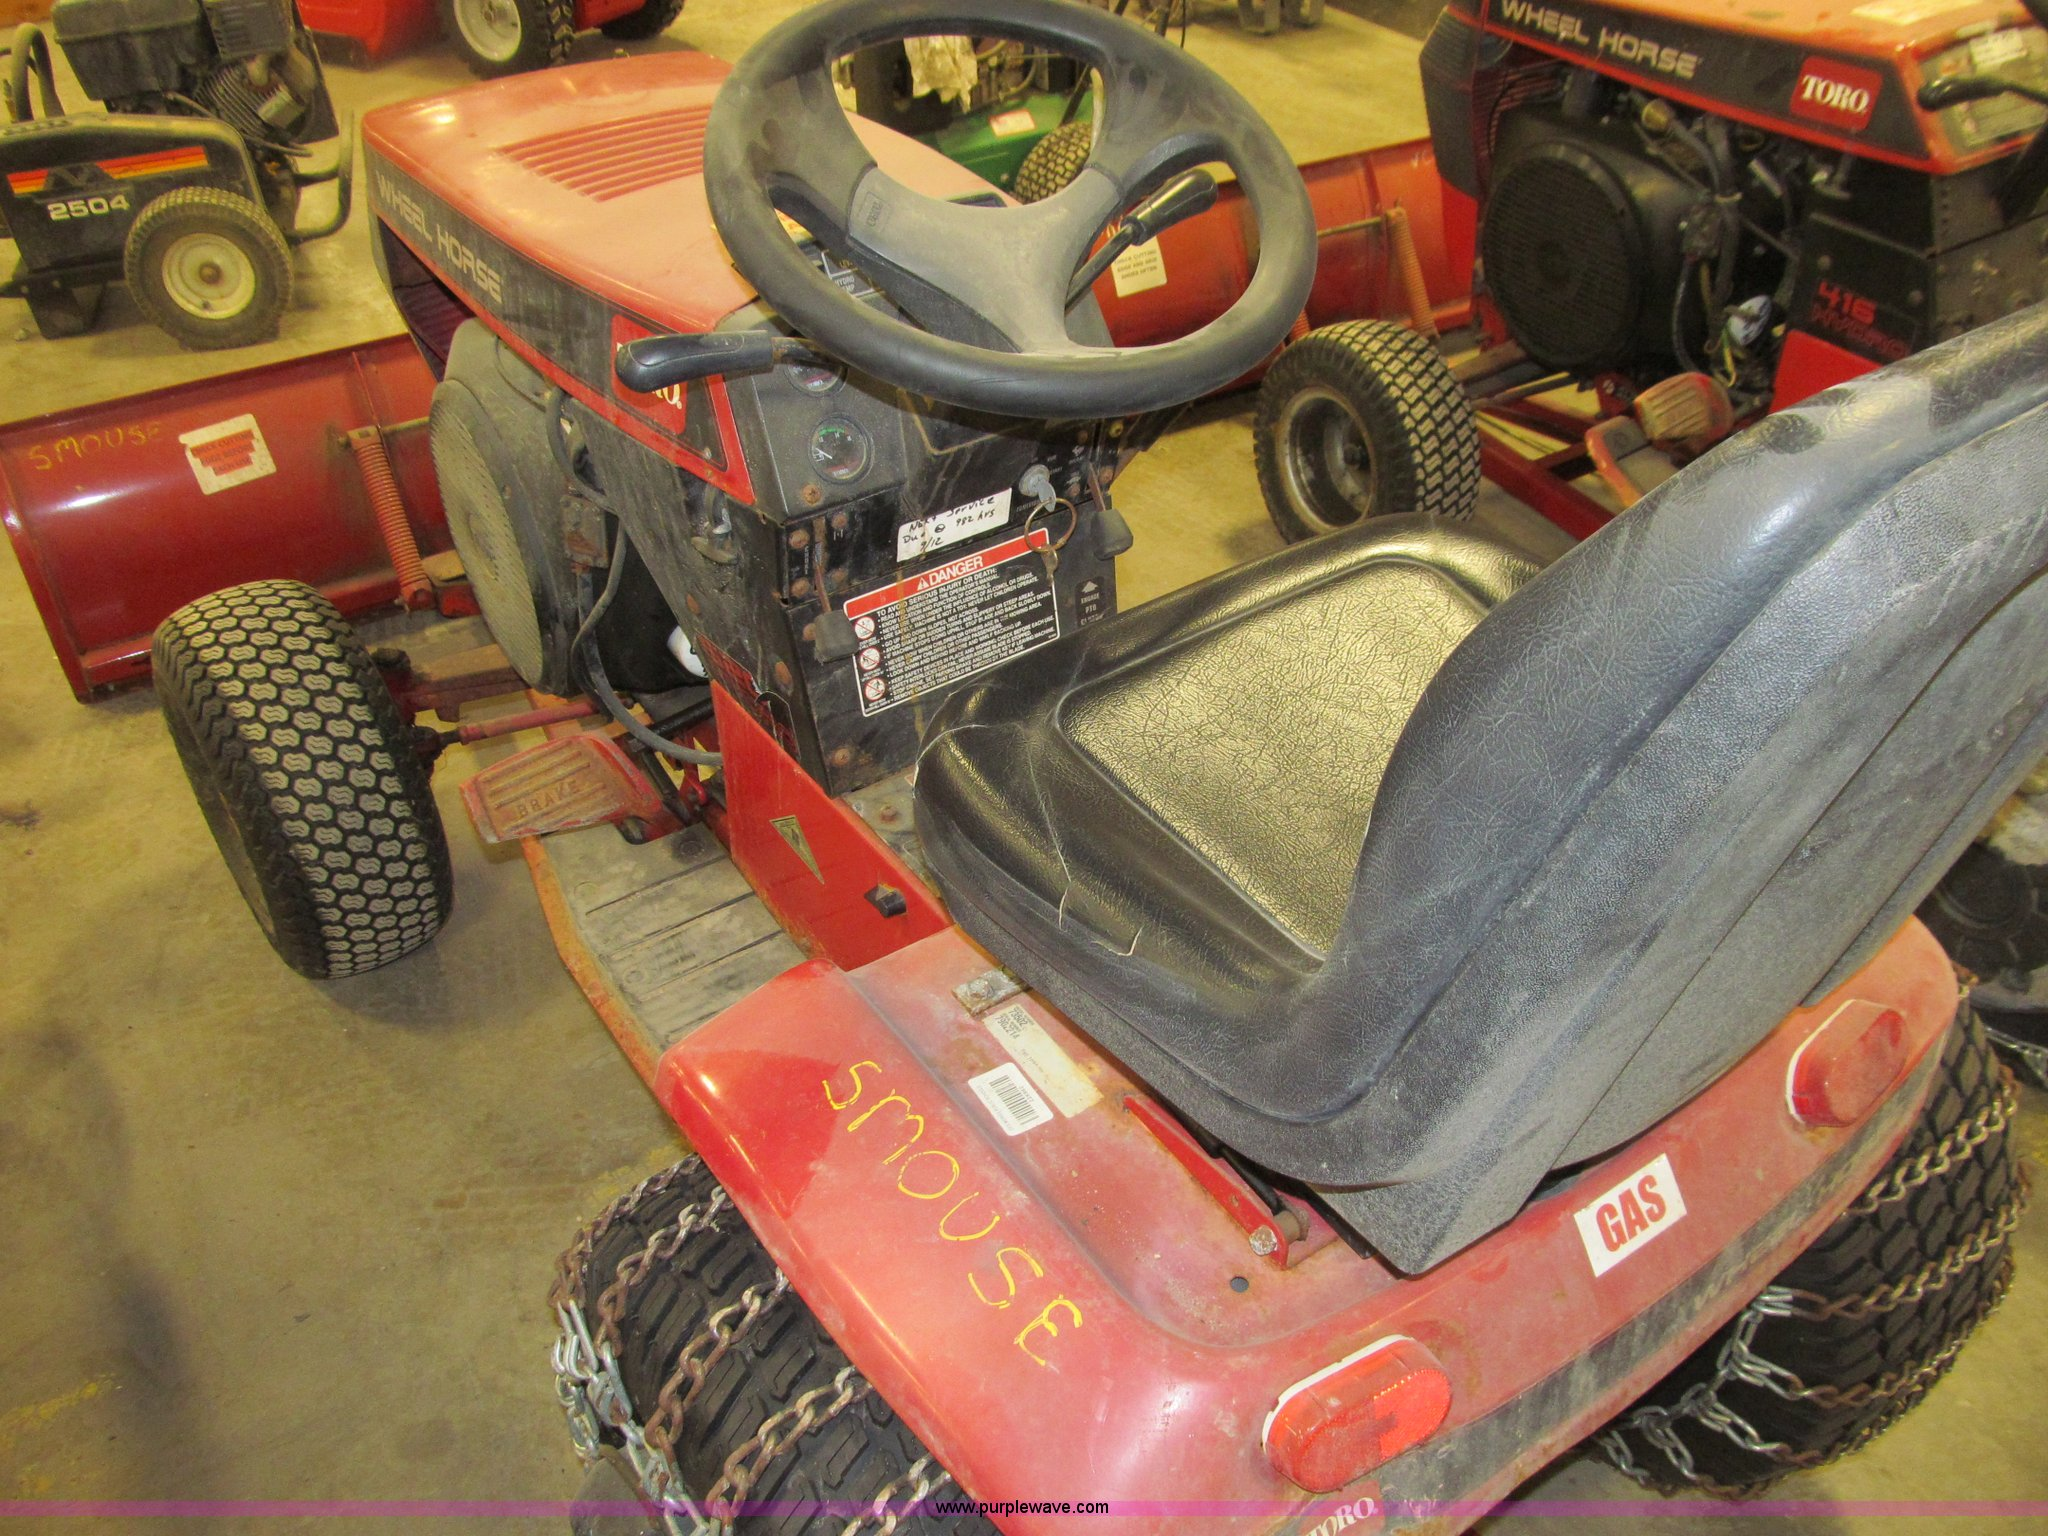 Toro 520 Hydro Wheel Horse Garden Tractor